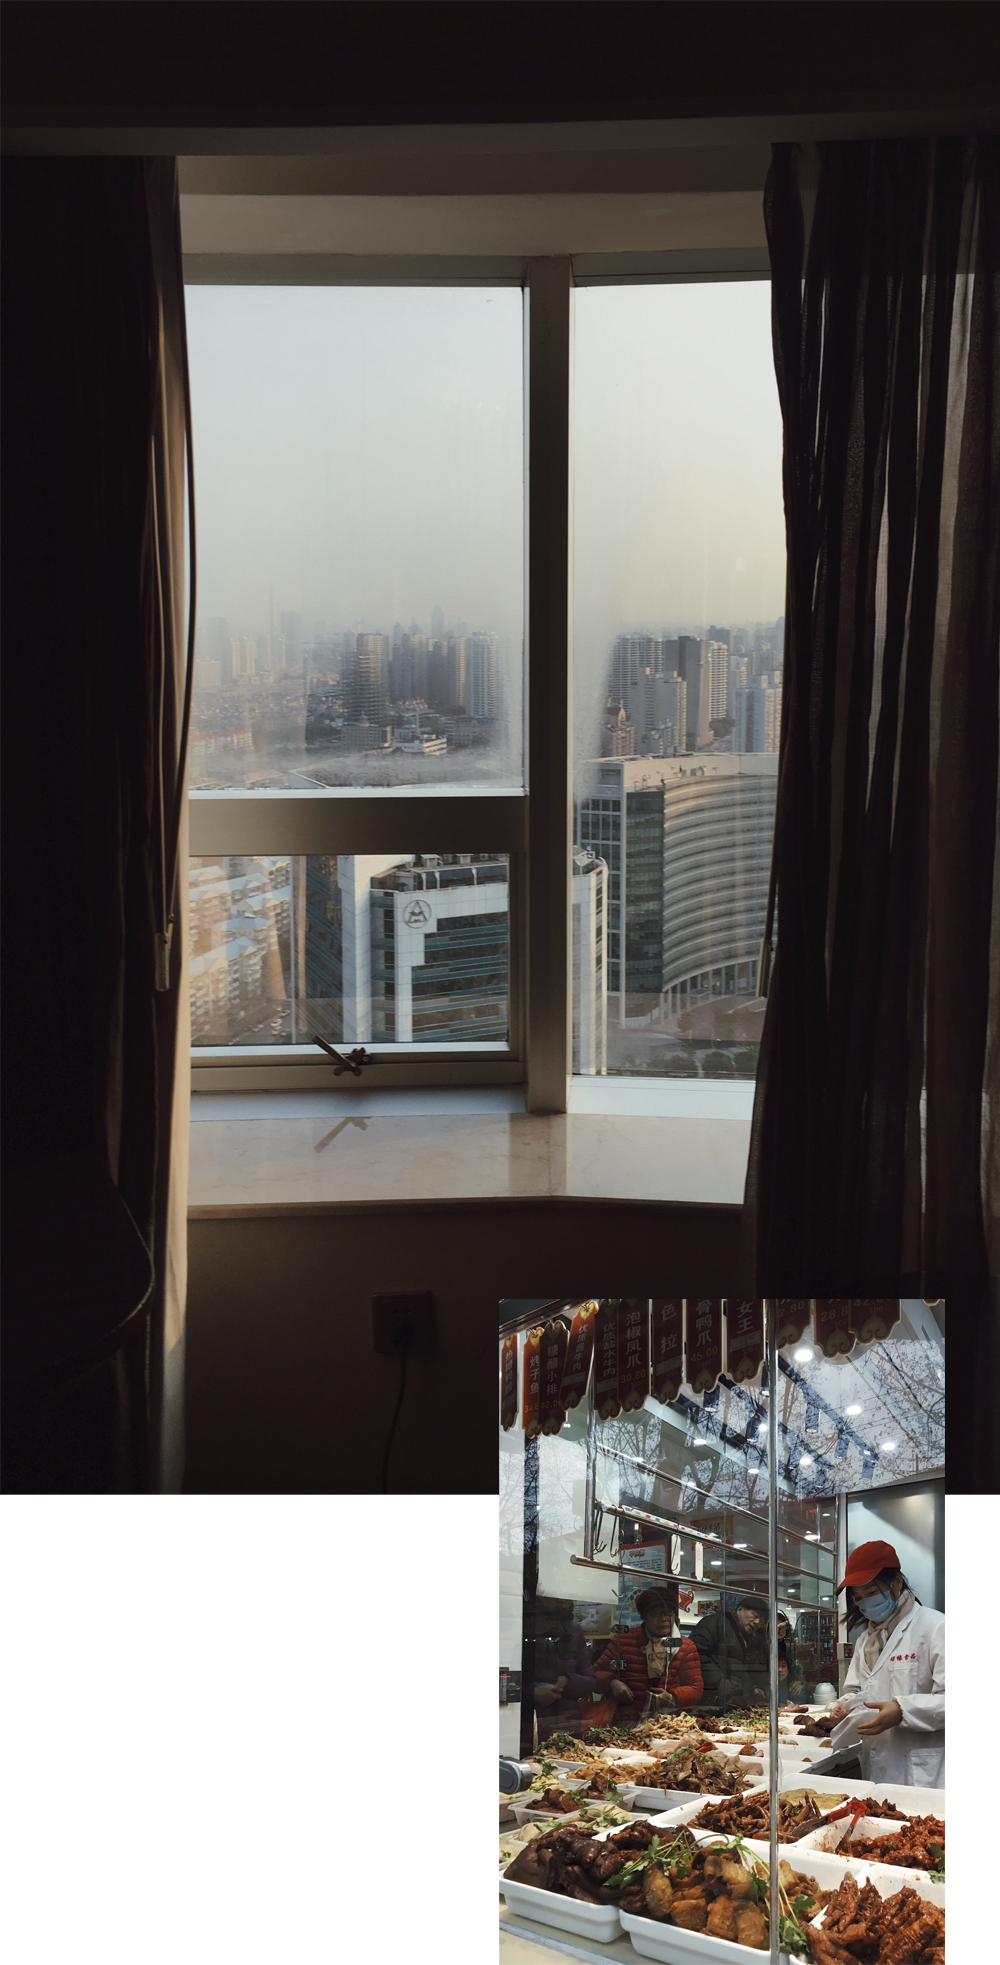 Shanghai_by_Amelie_Niederbuchner_1, Shanghai, Visual Diary, shot by Amelie Niederbuchner, photographer, Munich